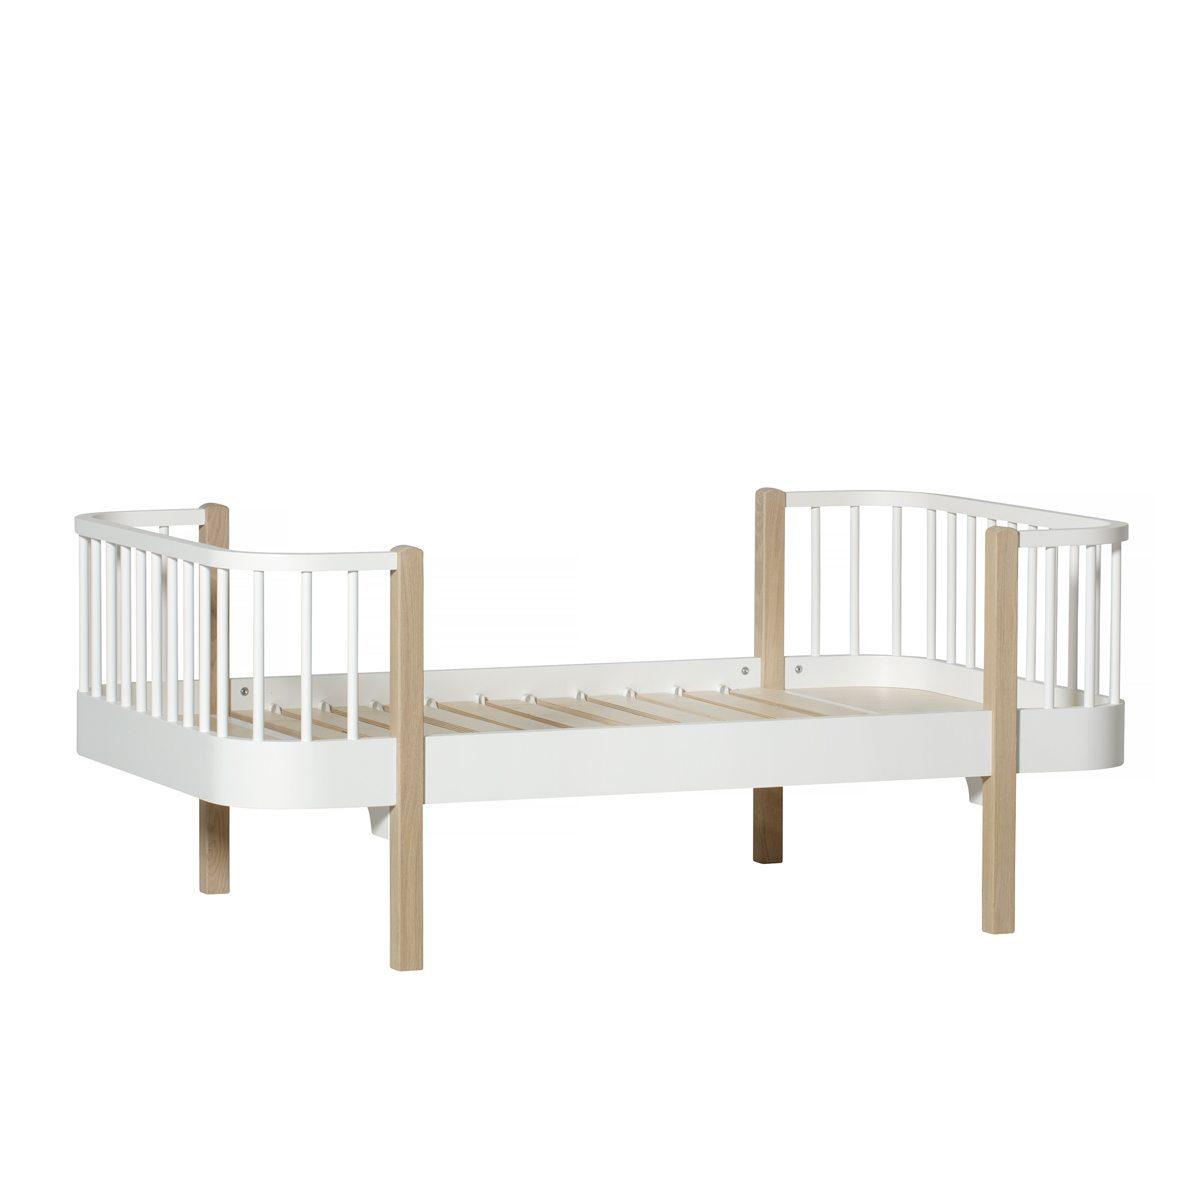 Oliver Furniture juniorbed Wood 160 cm white oak